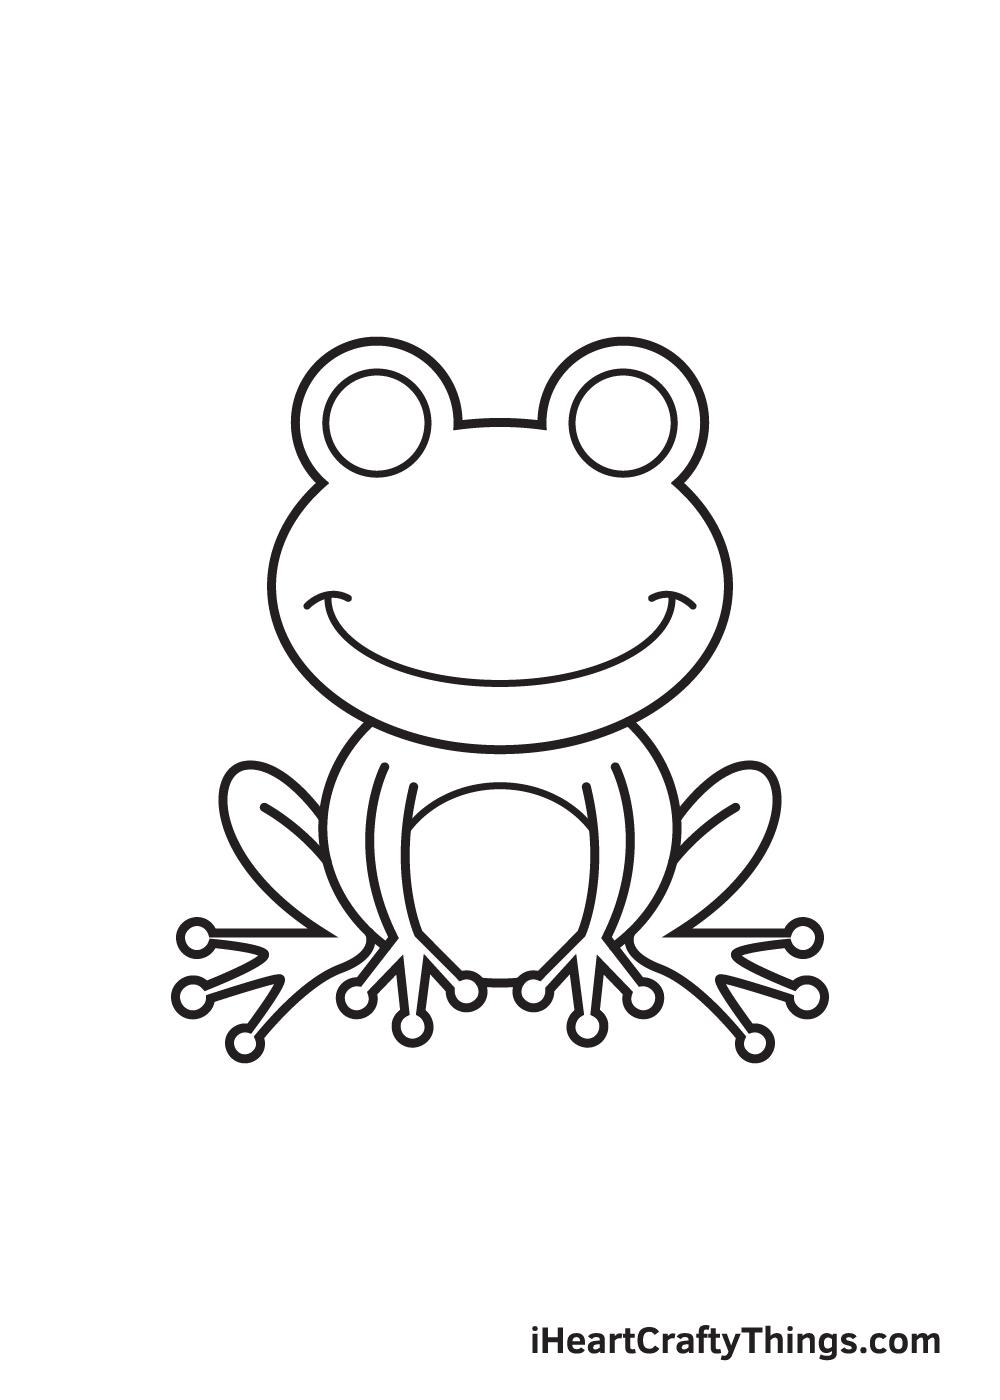 Frog Drawing – Step 8